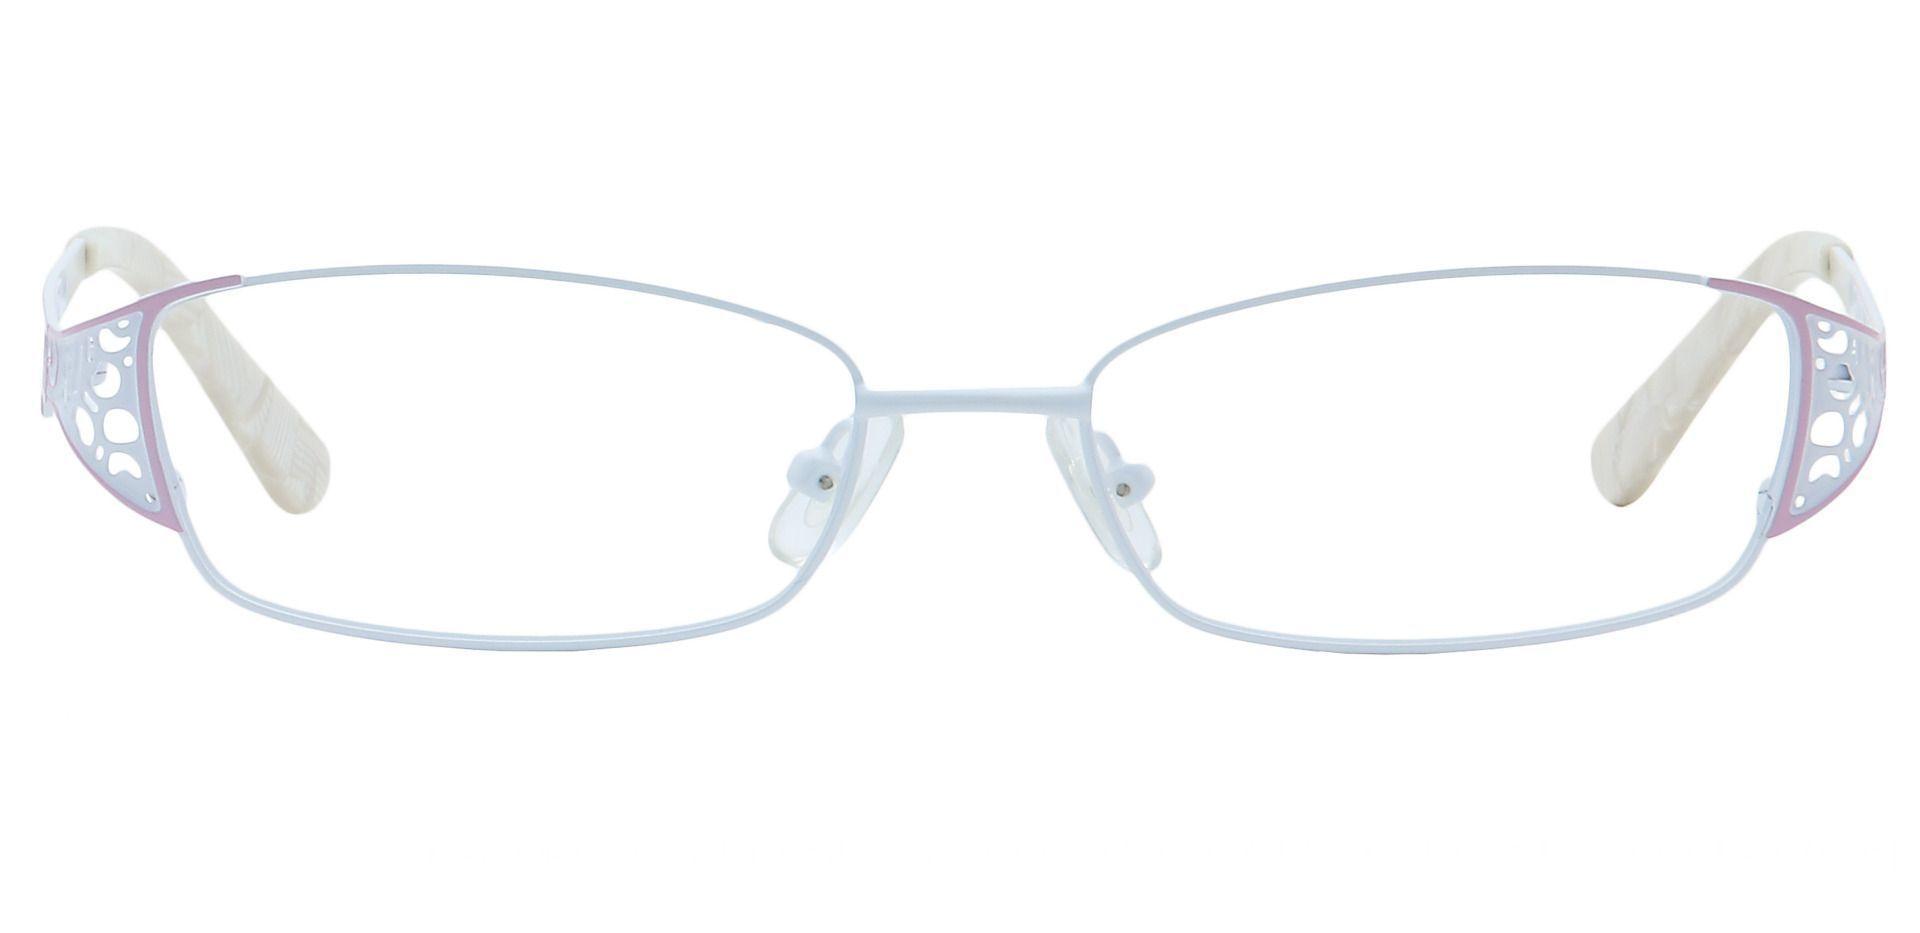 Alina Oval Blue Light Blocking Glasses - White